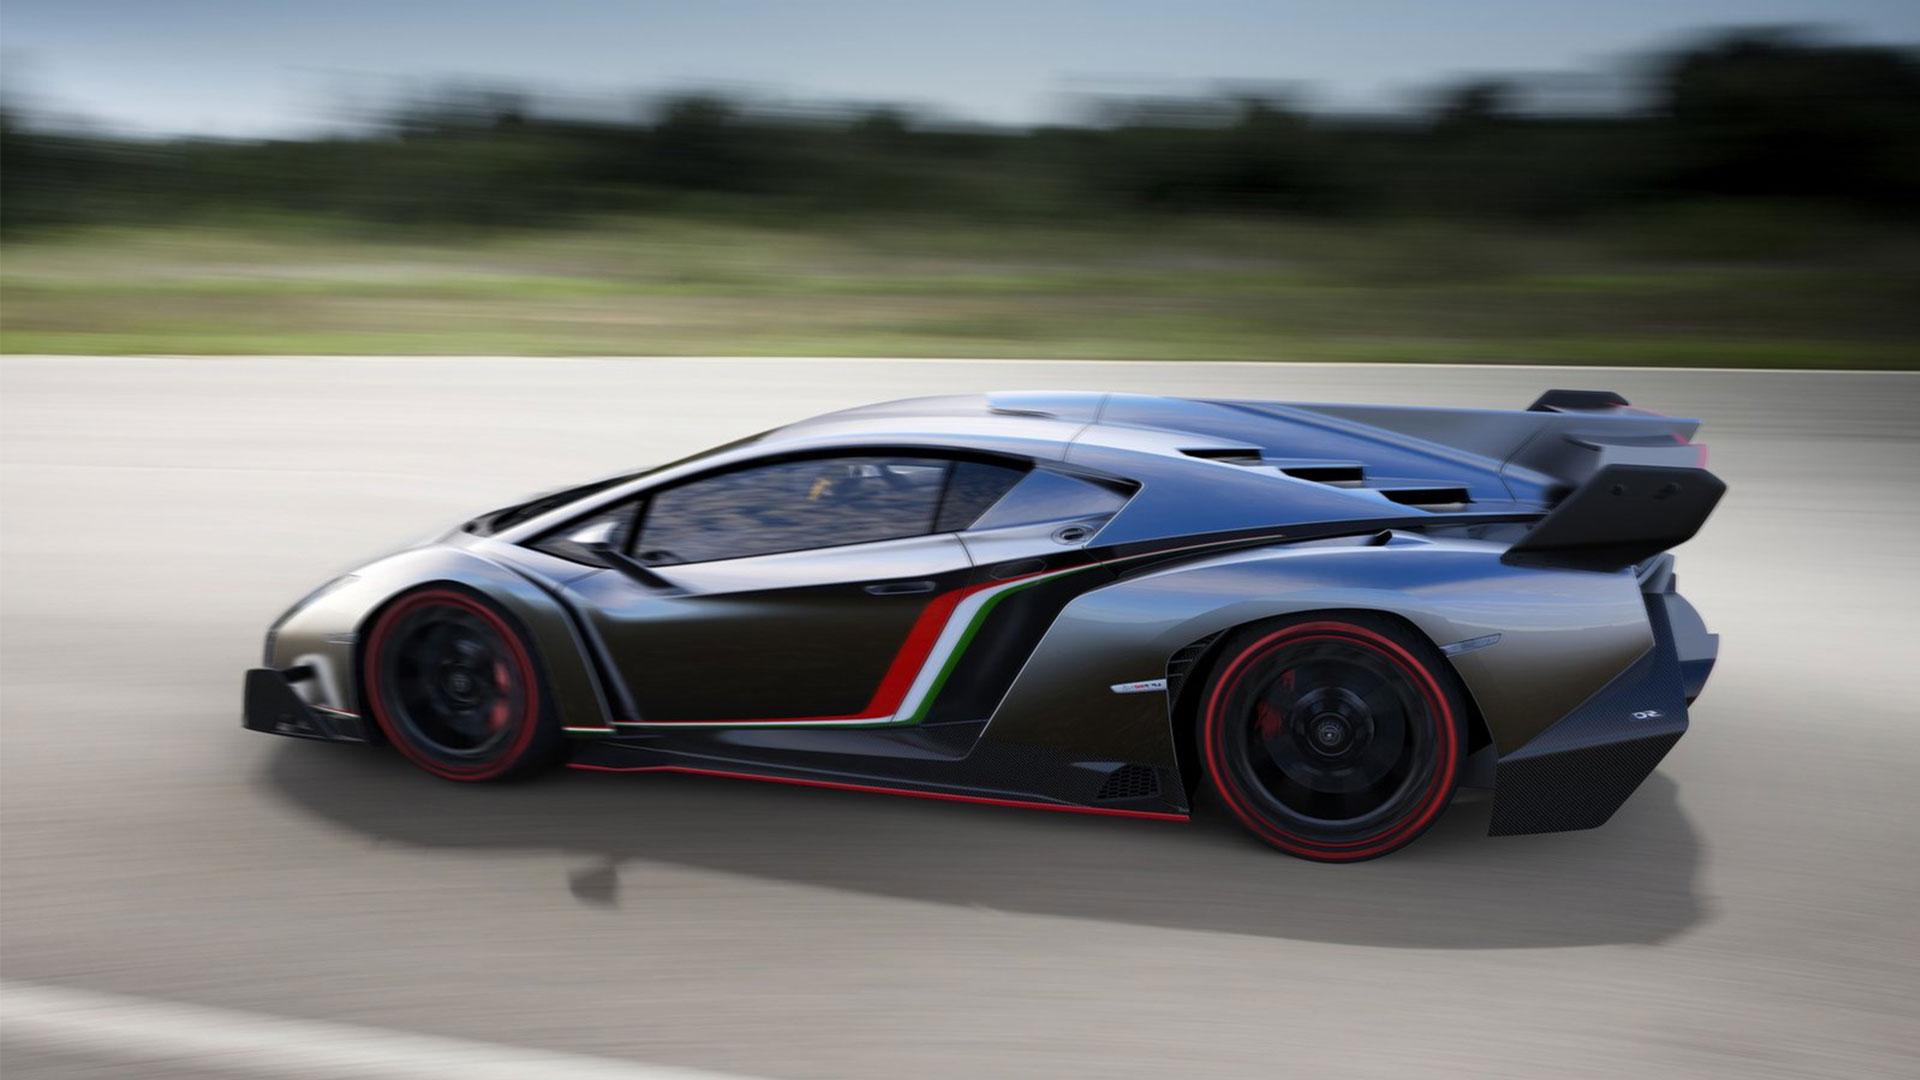 Very Cute Wallpapers For Facebook Lamborghini Veneno Wallpaper